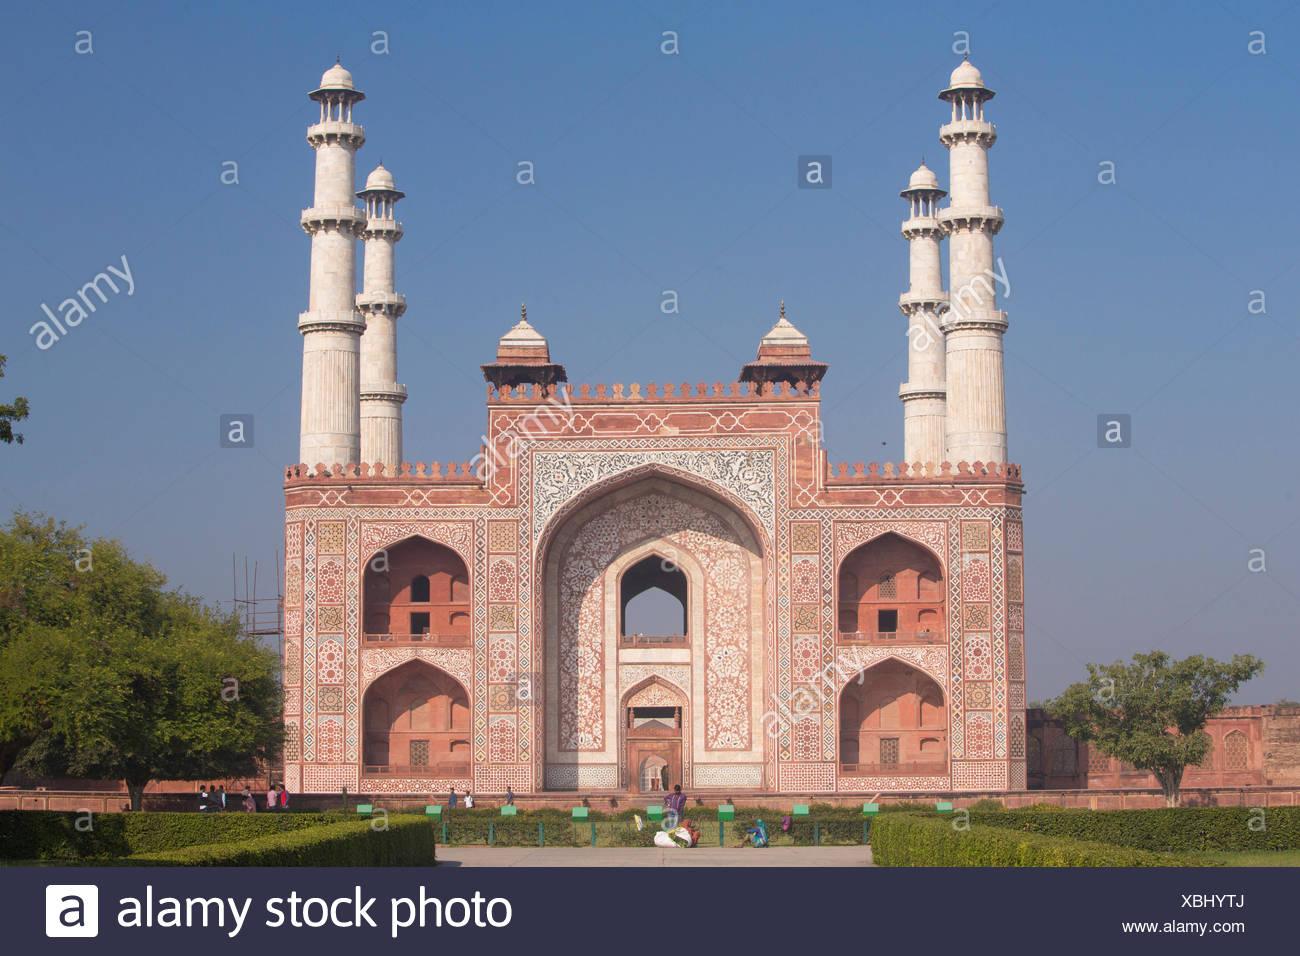 Sikandra, tombeau, Agra, Uttar Pradesh, tours, de la religion, de l'Asie, Photo Stock